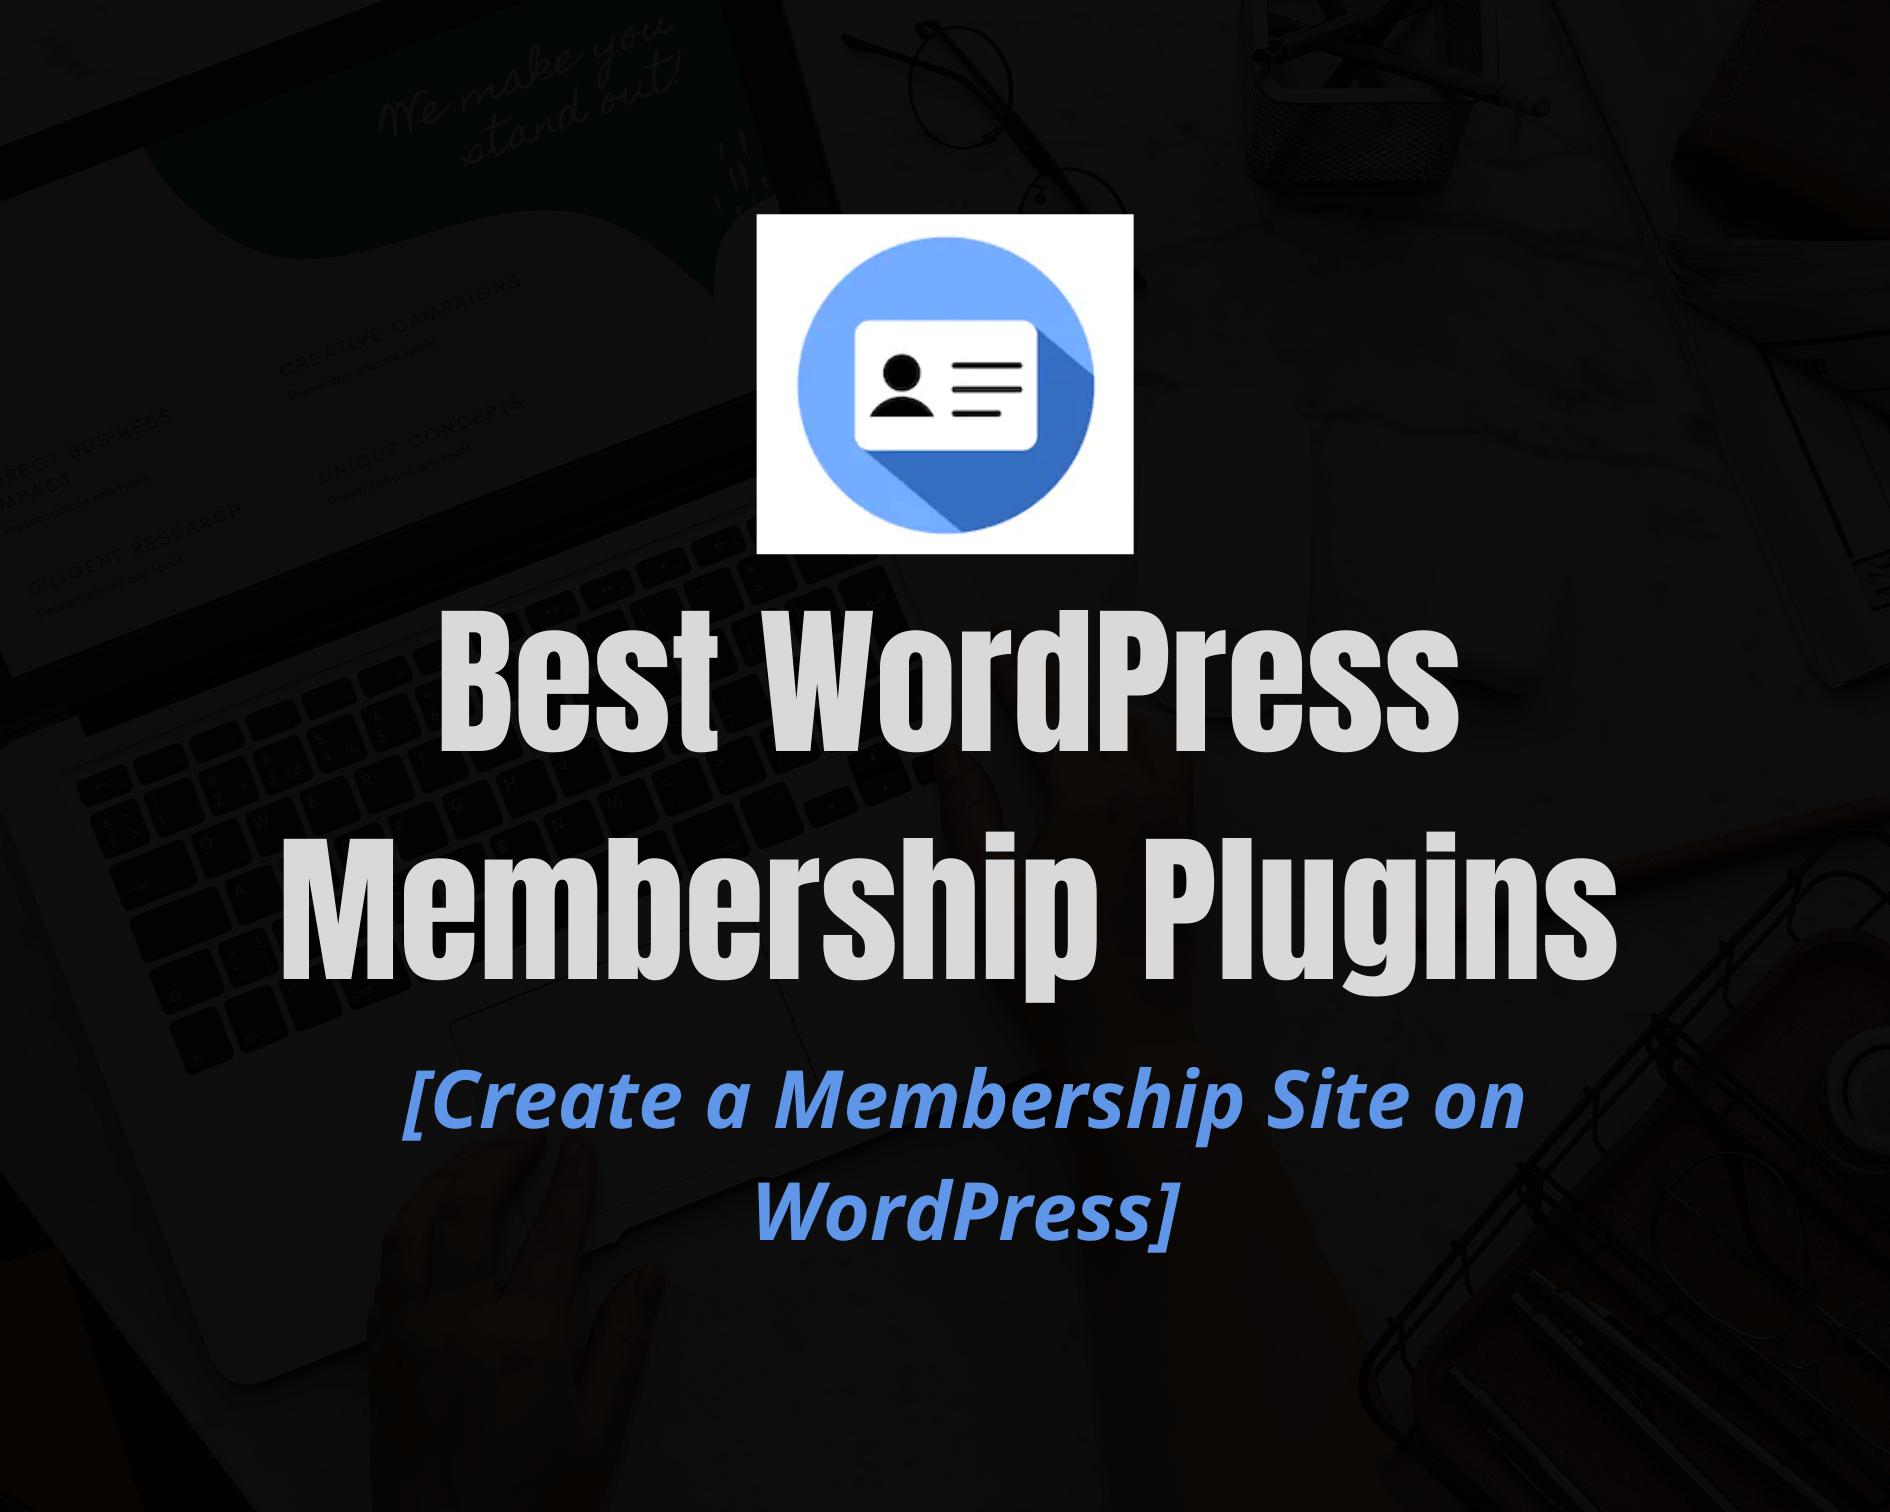 7 Best WordPress Membership Plugins  for 2020